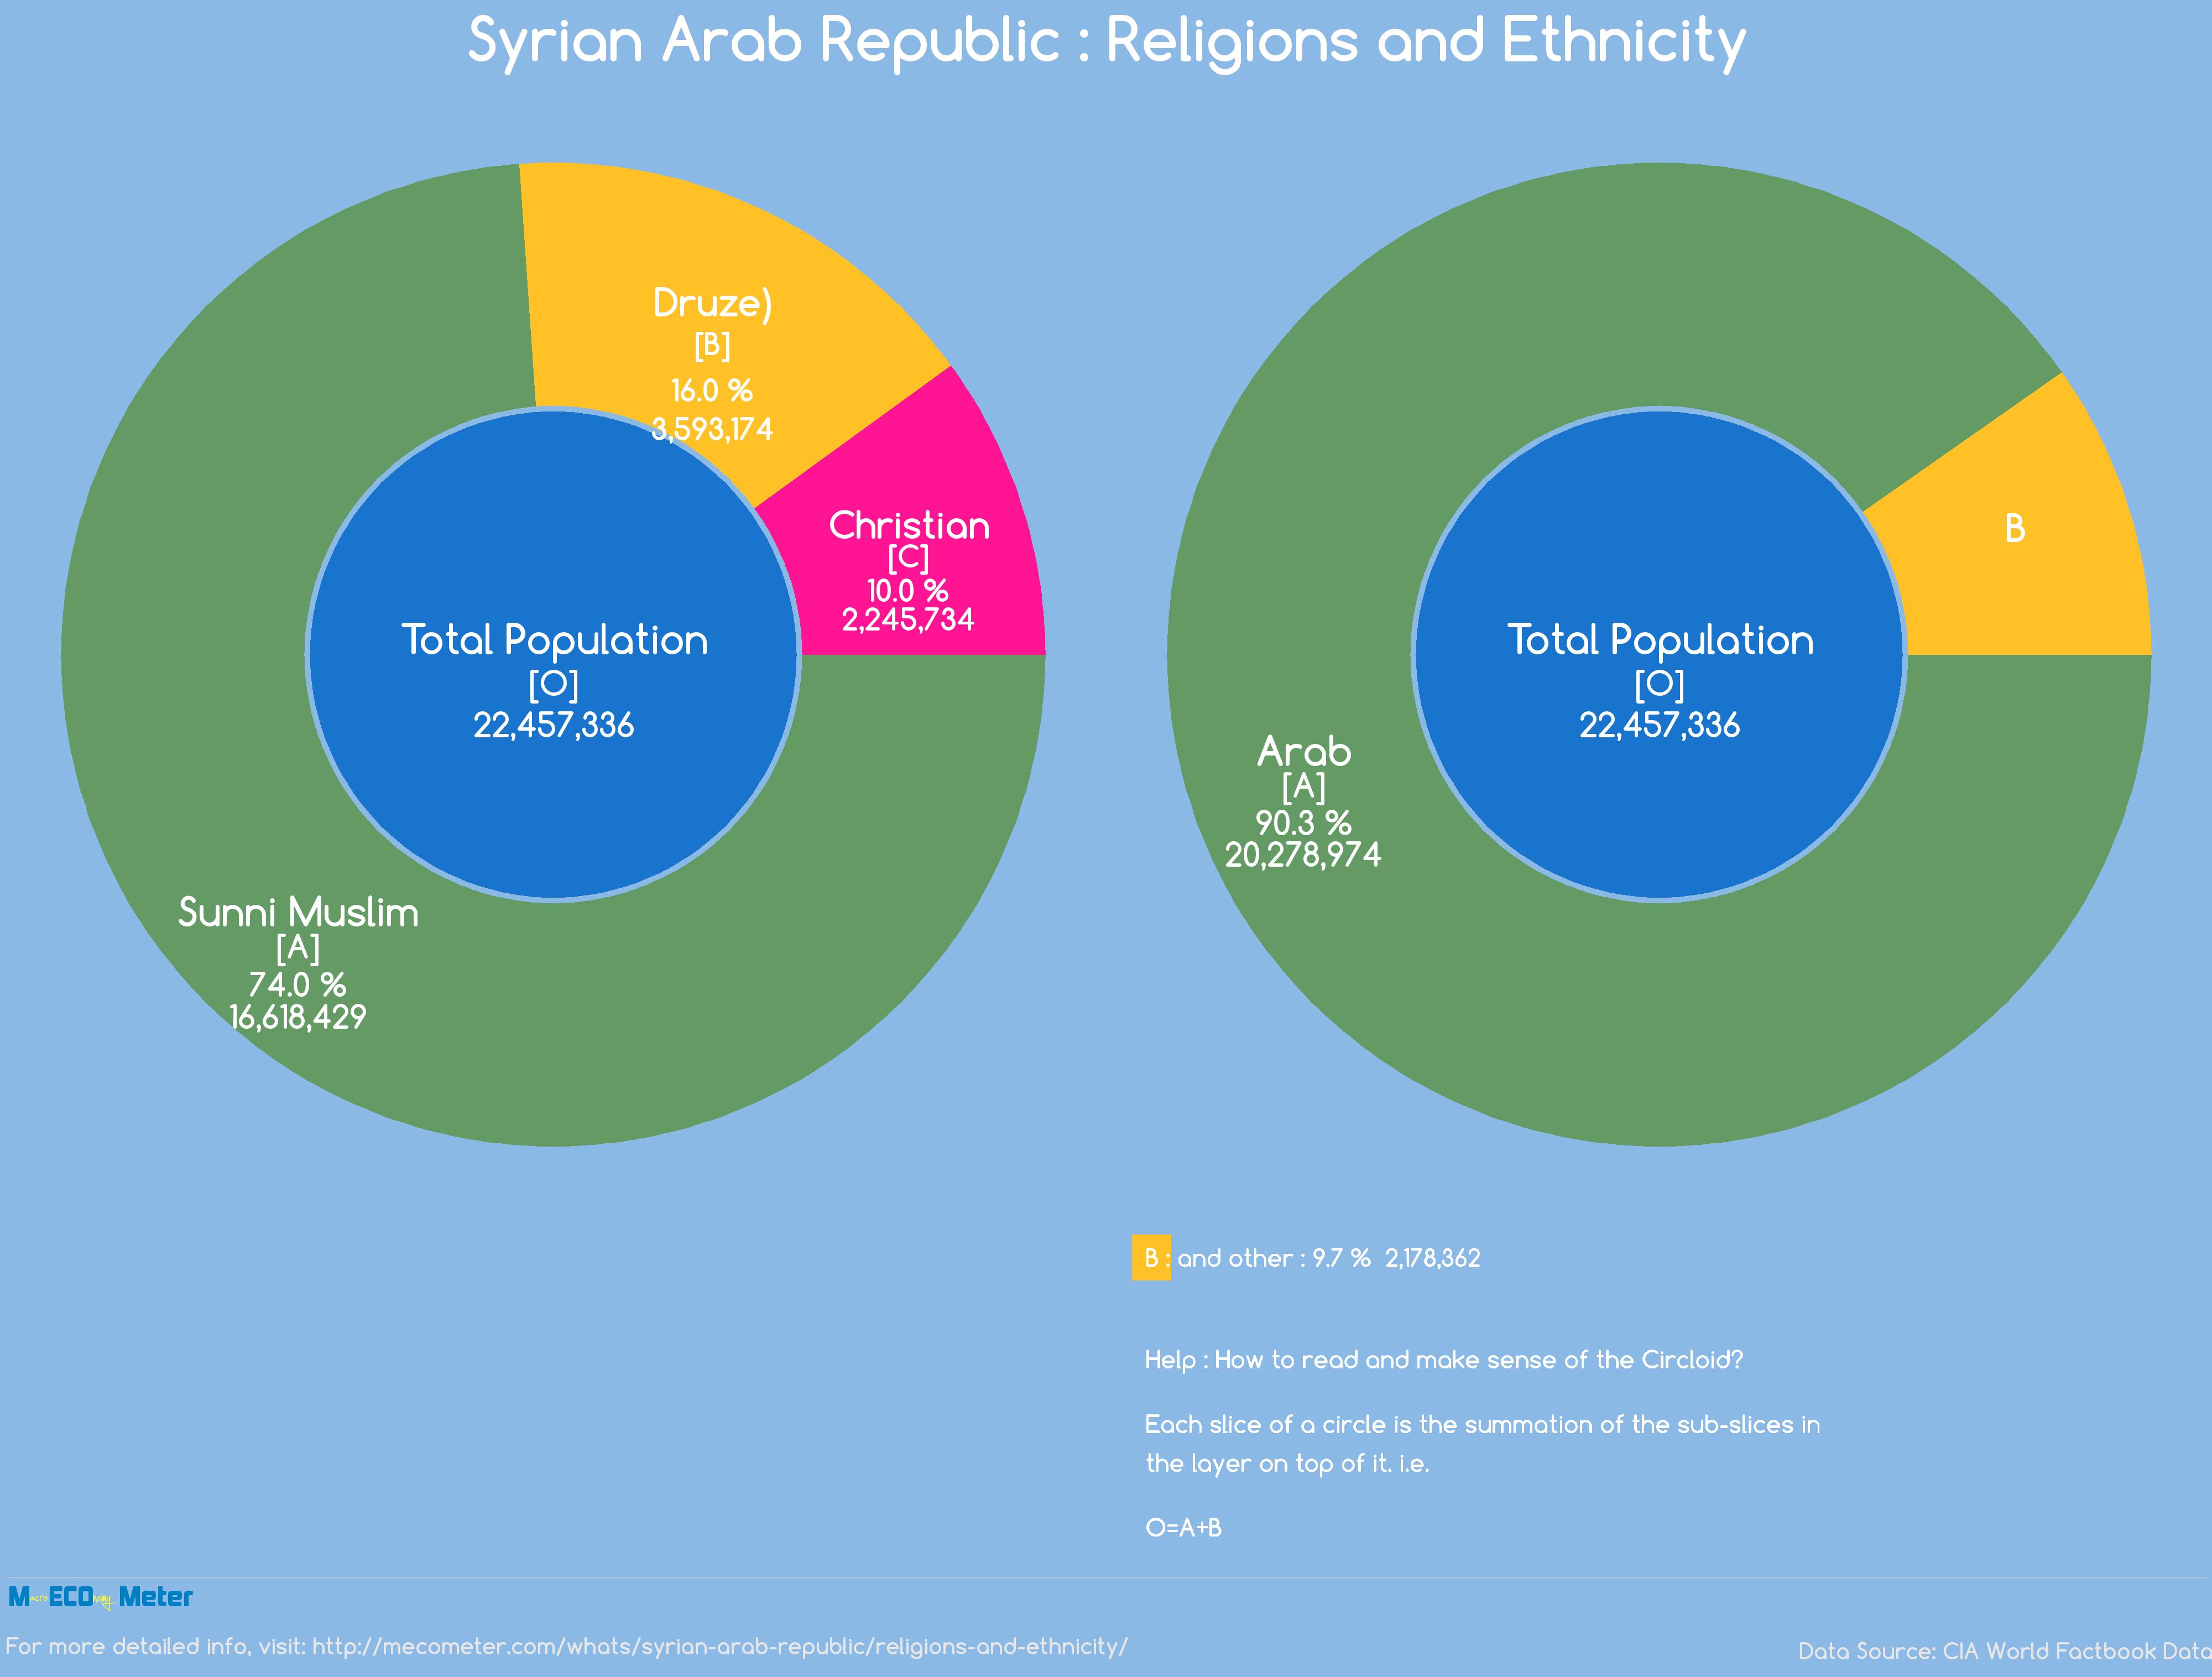 Syrian Arab Republic : Religions and Ethnicity